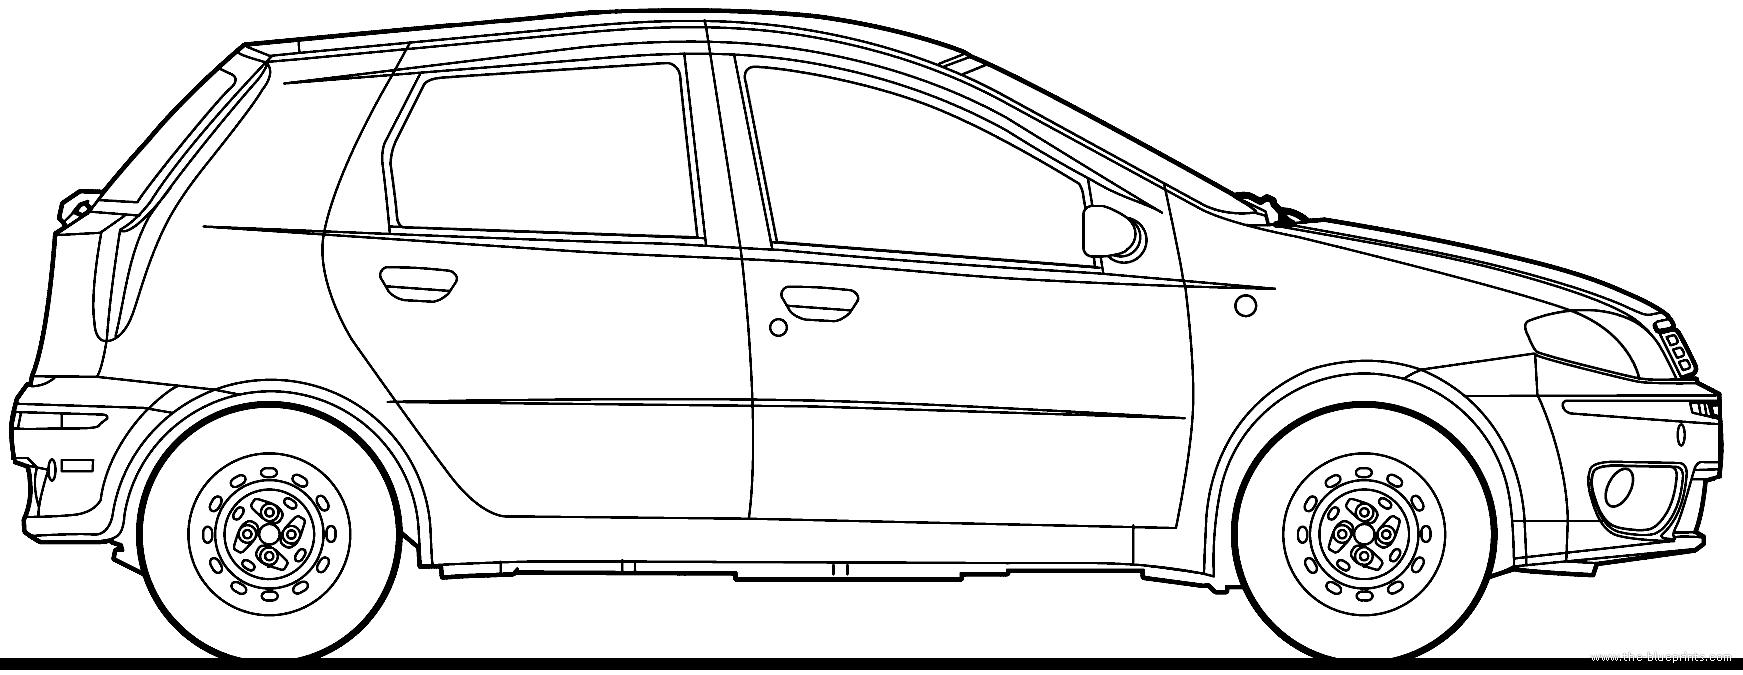 Blueprints > Cars > Fiat > Fiat Punto 5-Door (2008)